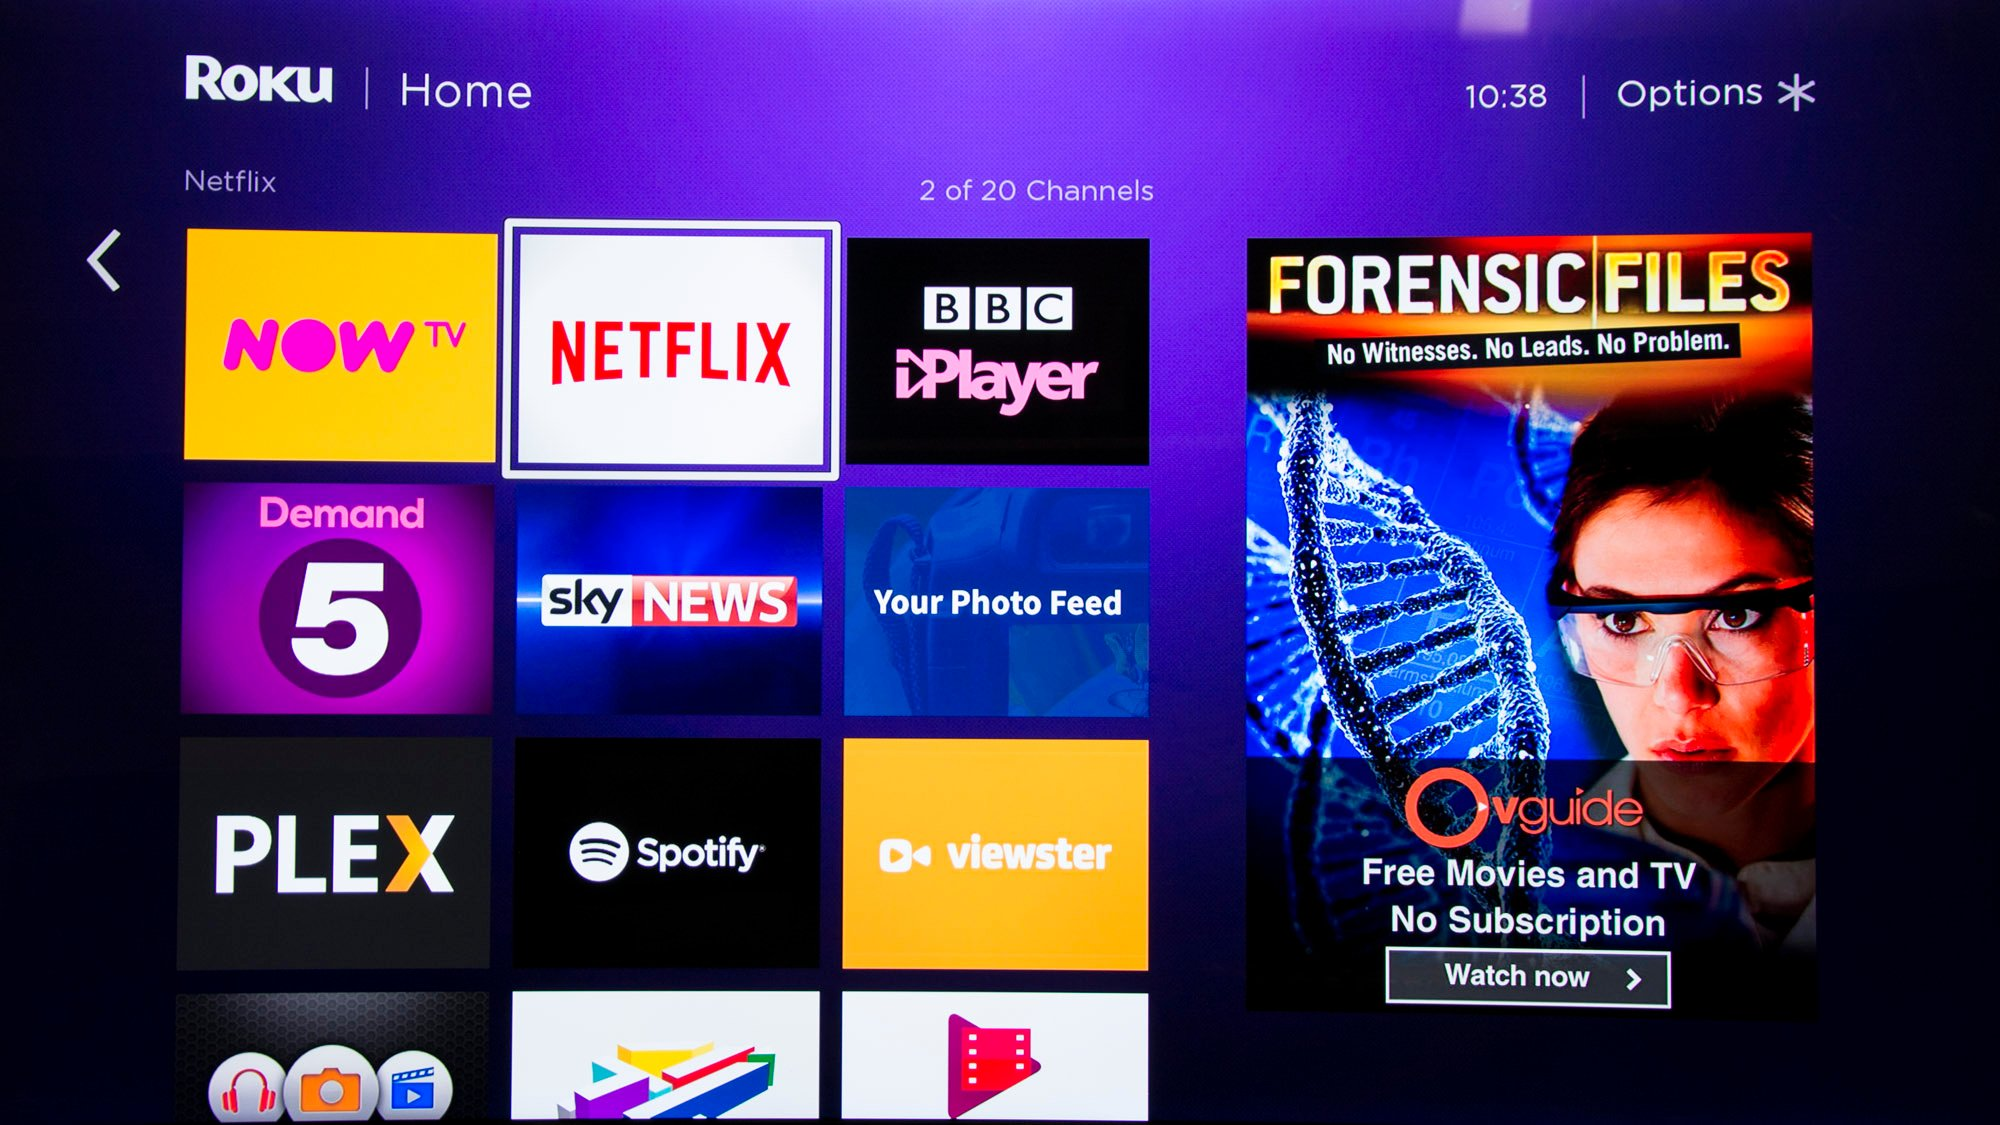 Amazon Fire TV Stick vs Chromecast vs Now TV Stick vs Roku Streaming